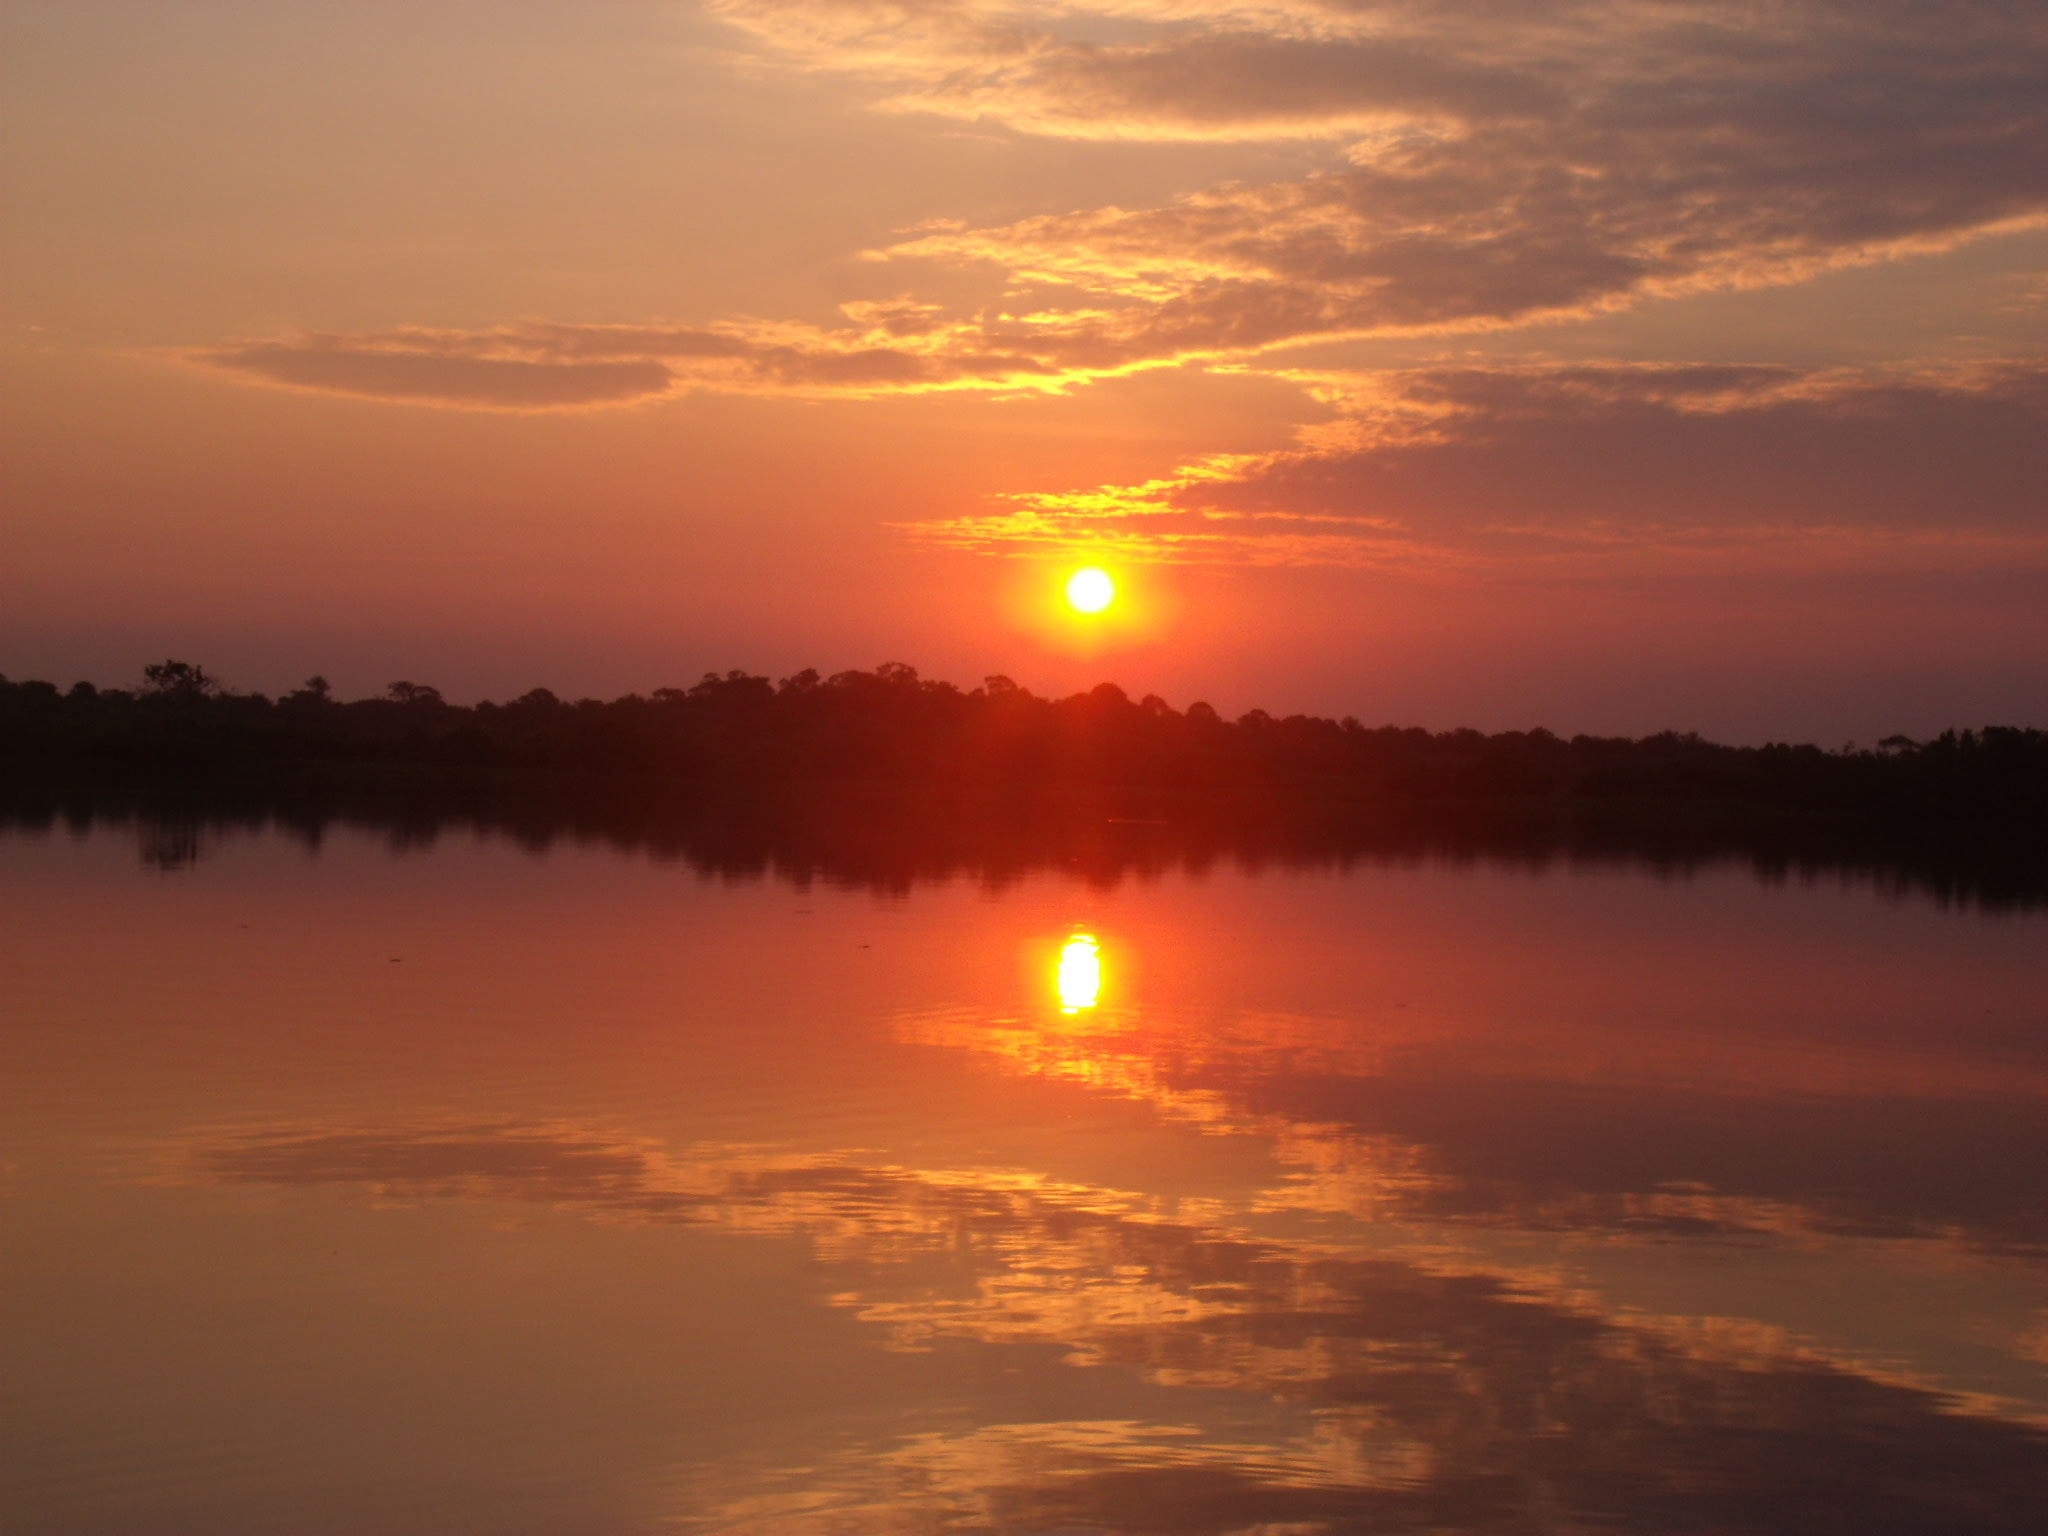 Sunset over Acajatuba River